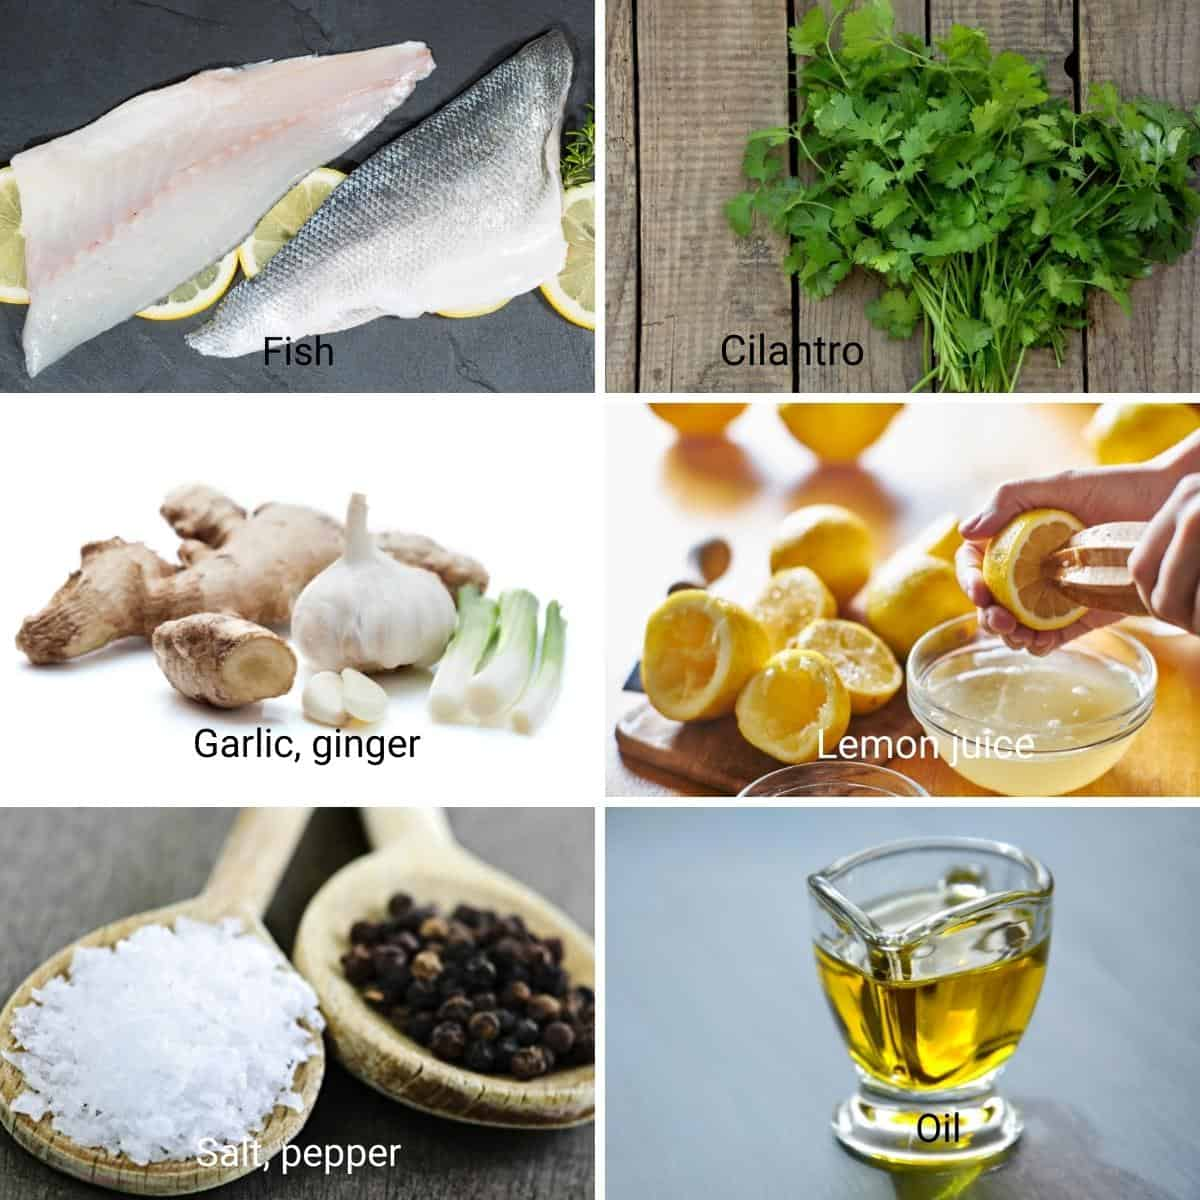 Ingredients for baking a fish fillet.